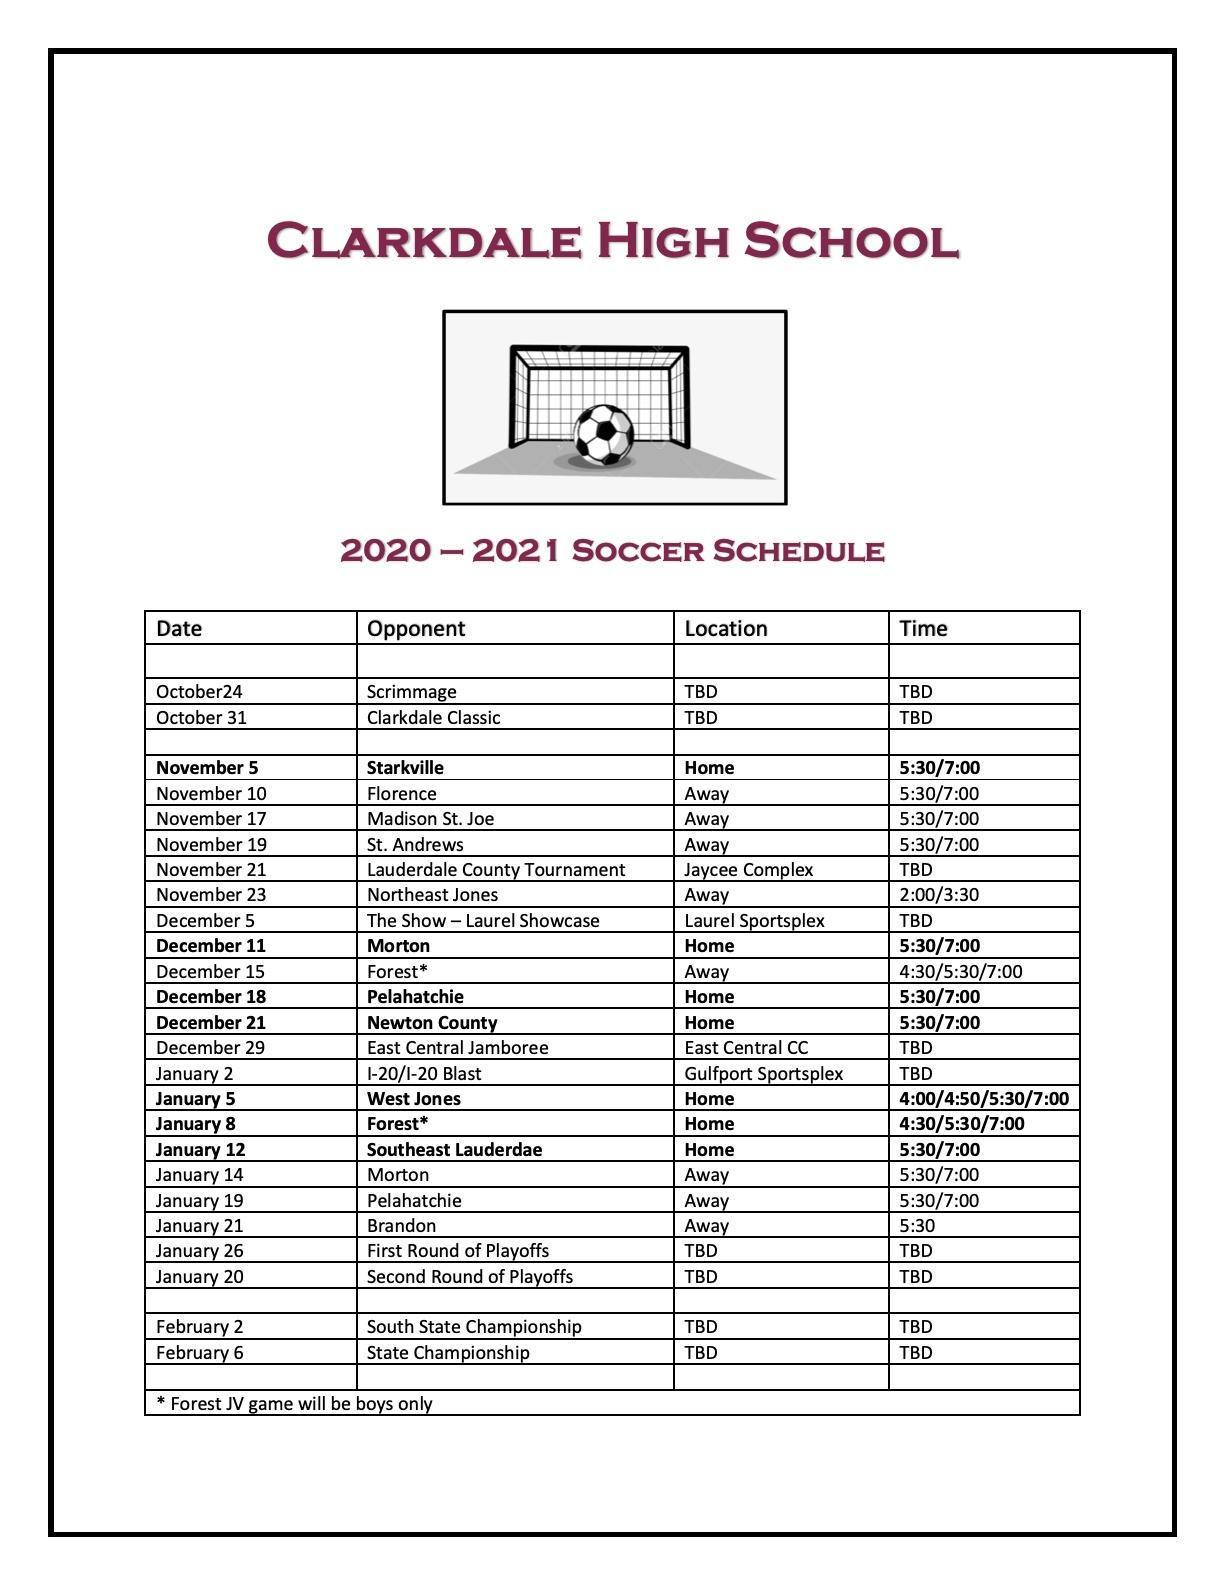 CHS Soccer Schedule